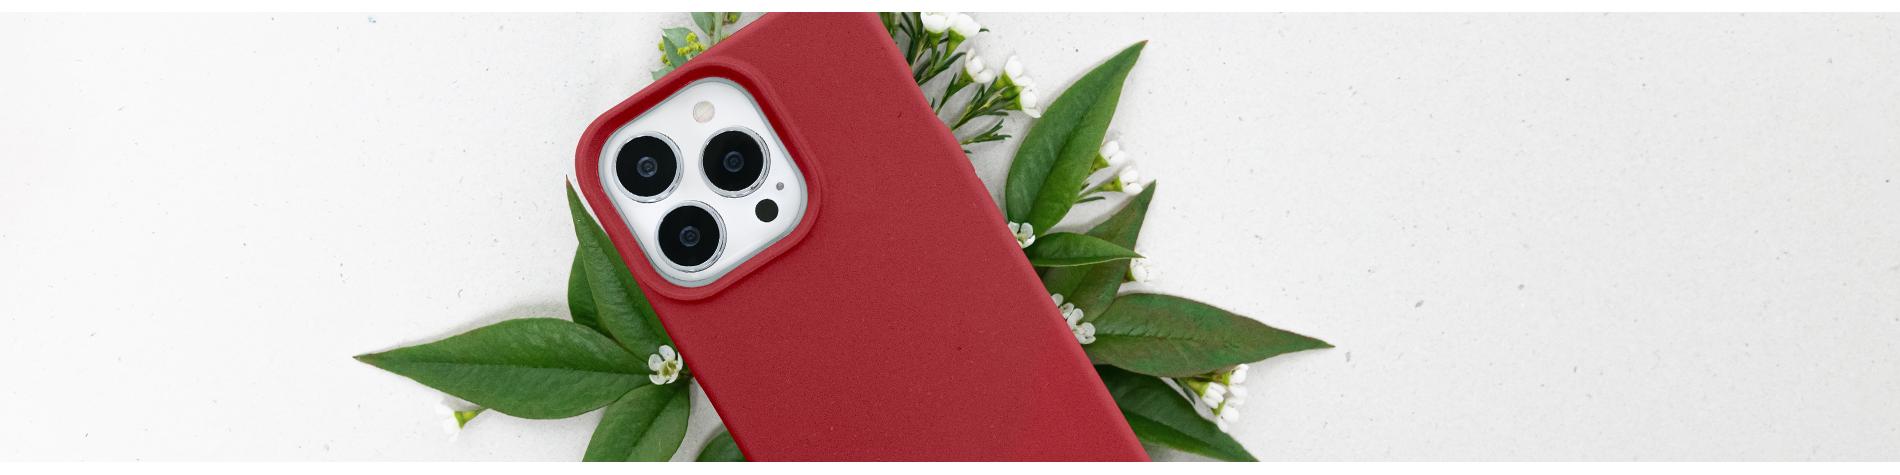 Coque smartphone biodégradable : la gamme Just Green